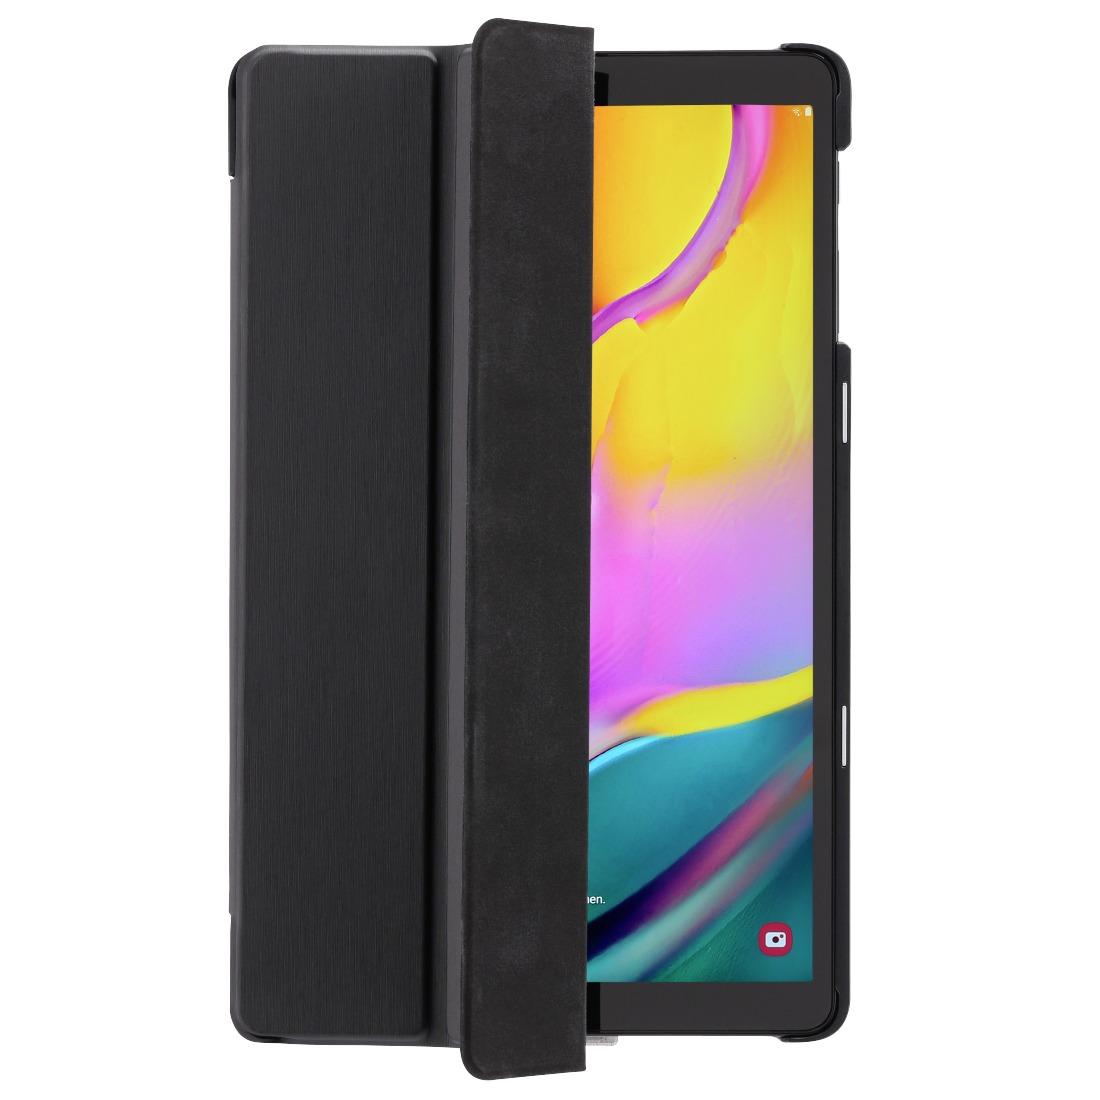 Korting Hama Portfolio Fold Galaxy Tab A 10.1 (2019) tablethoesje